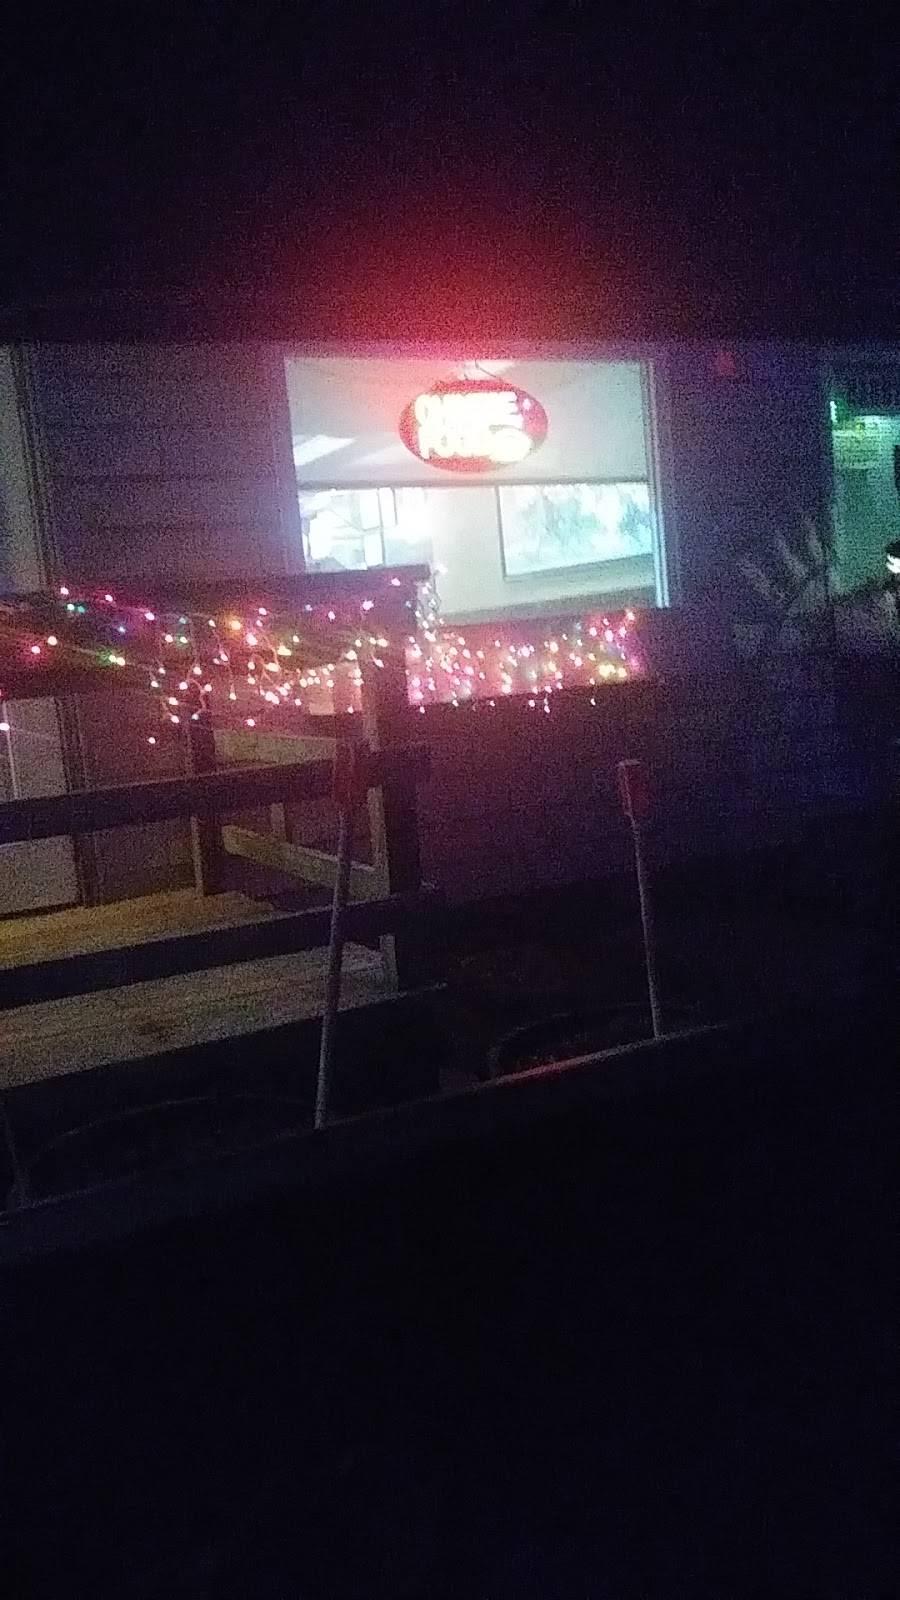 Yummy Yummy | restaurant | 5005 54, CT-37, New Fairfield, CT 06812, USA | 2033129557 OR +1 203-312-9557